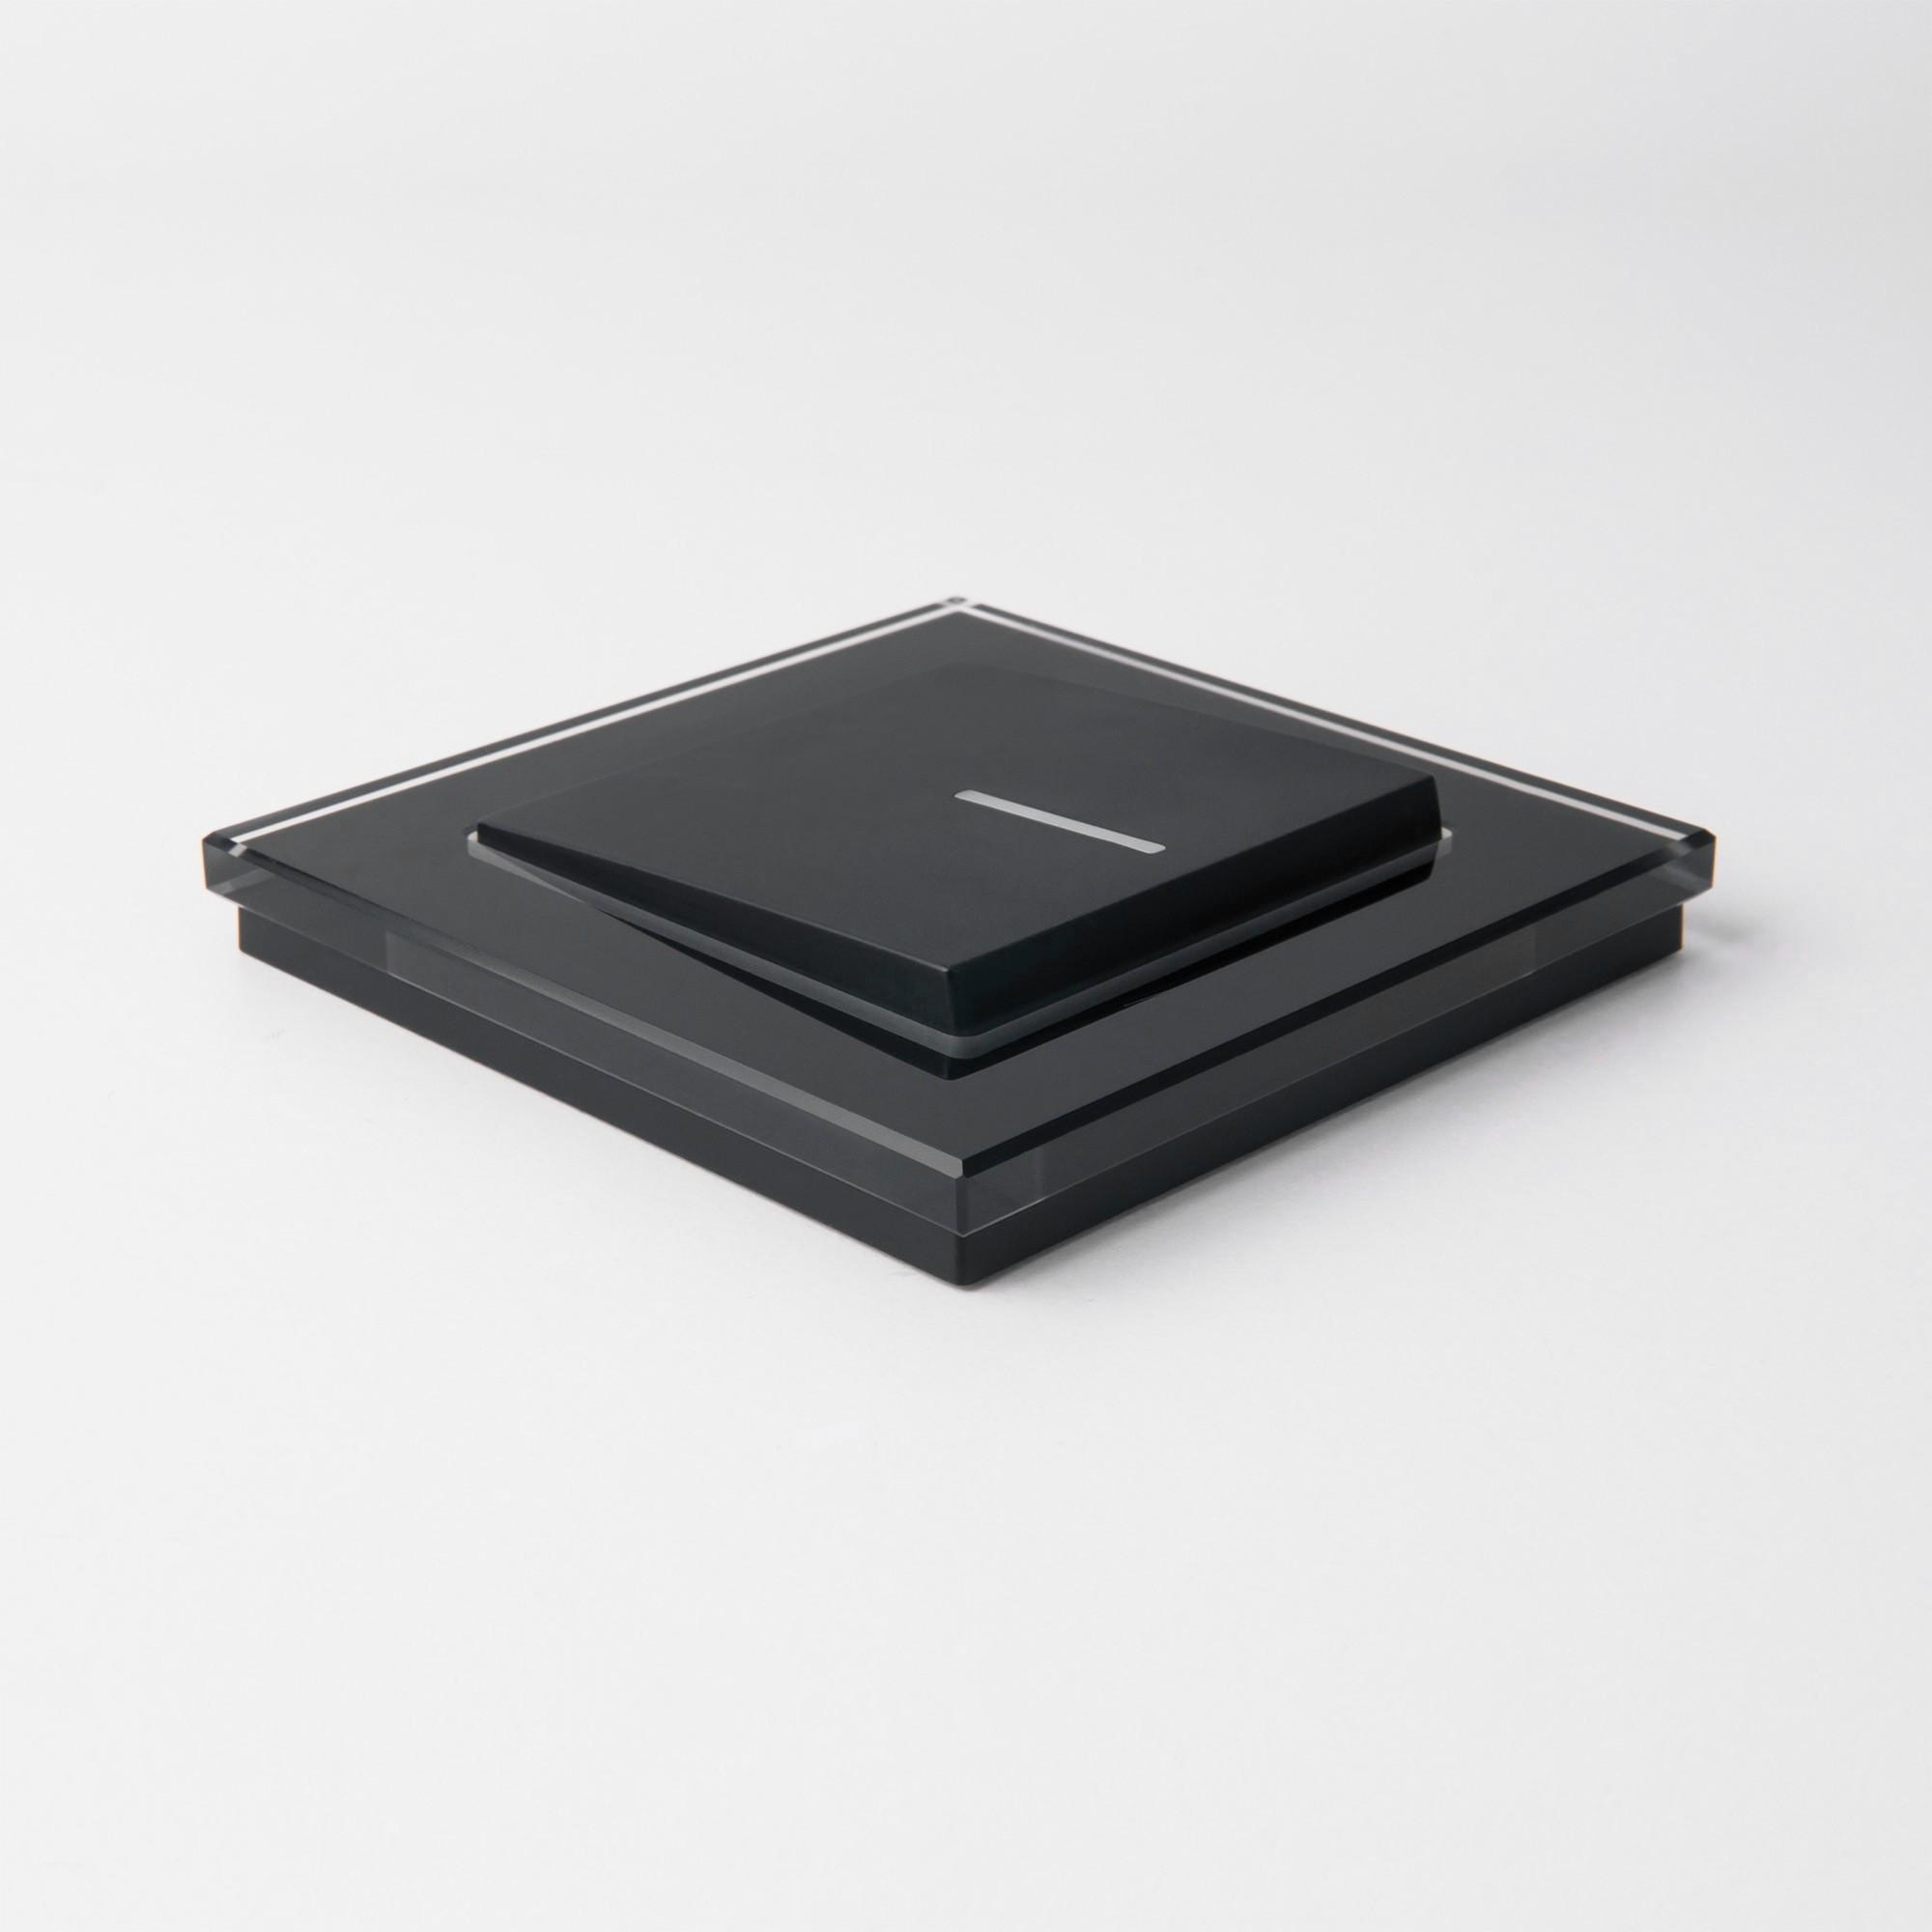 WL01-Frame-01 / Рамка на 1 пост (черный,стекло)